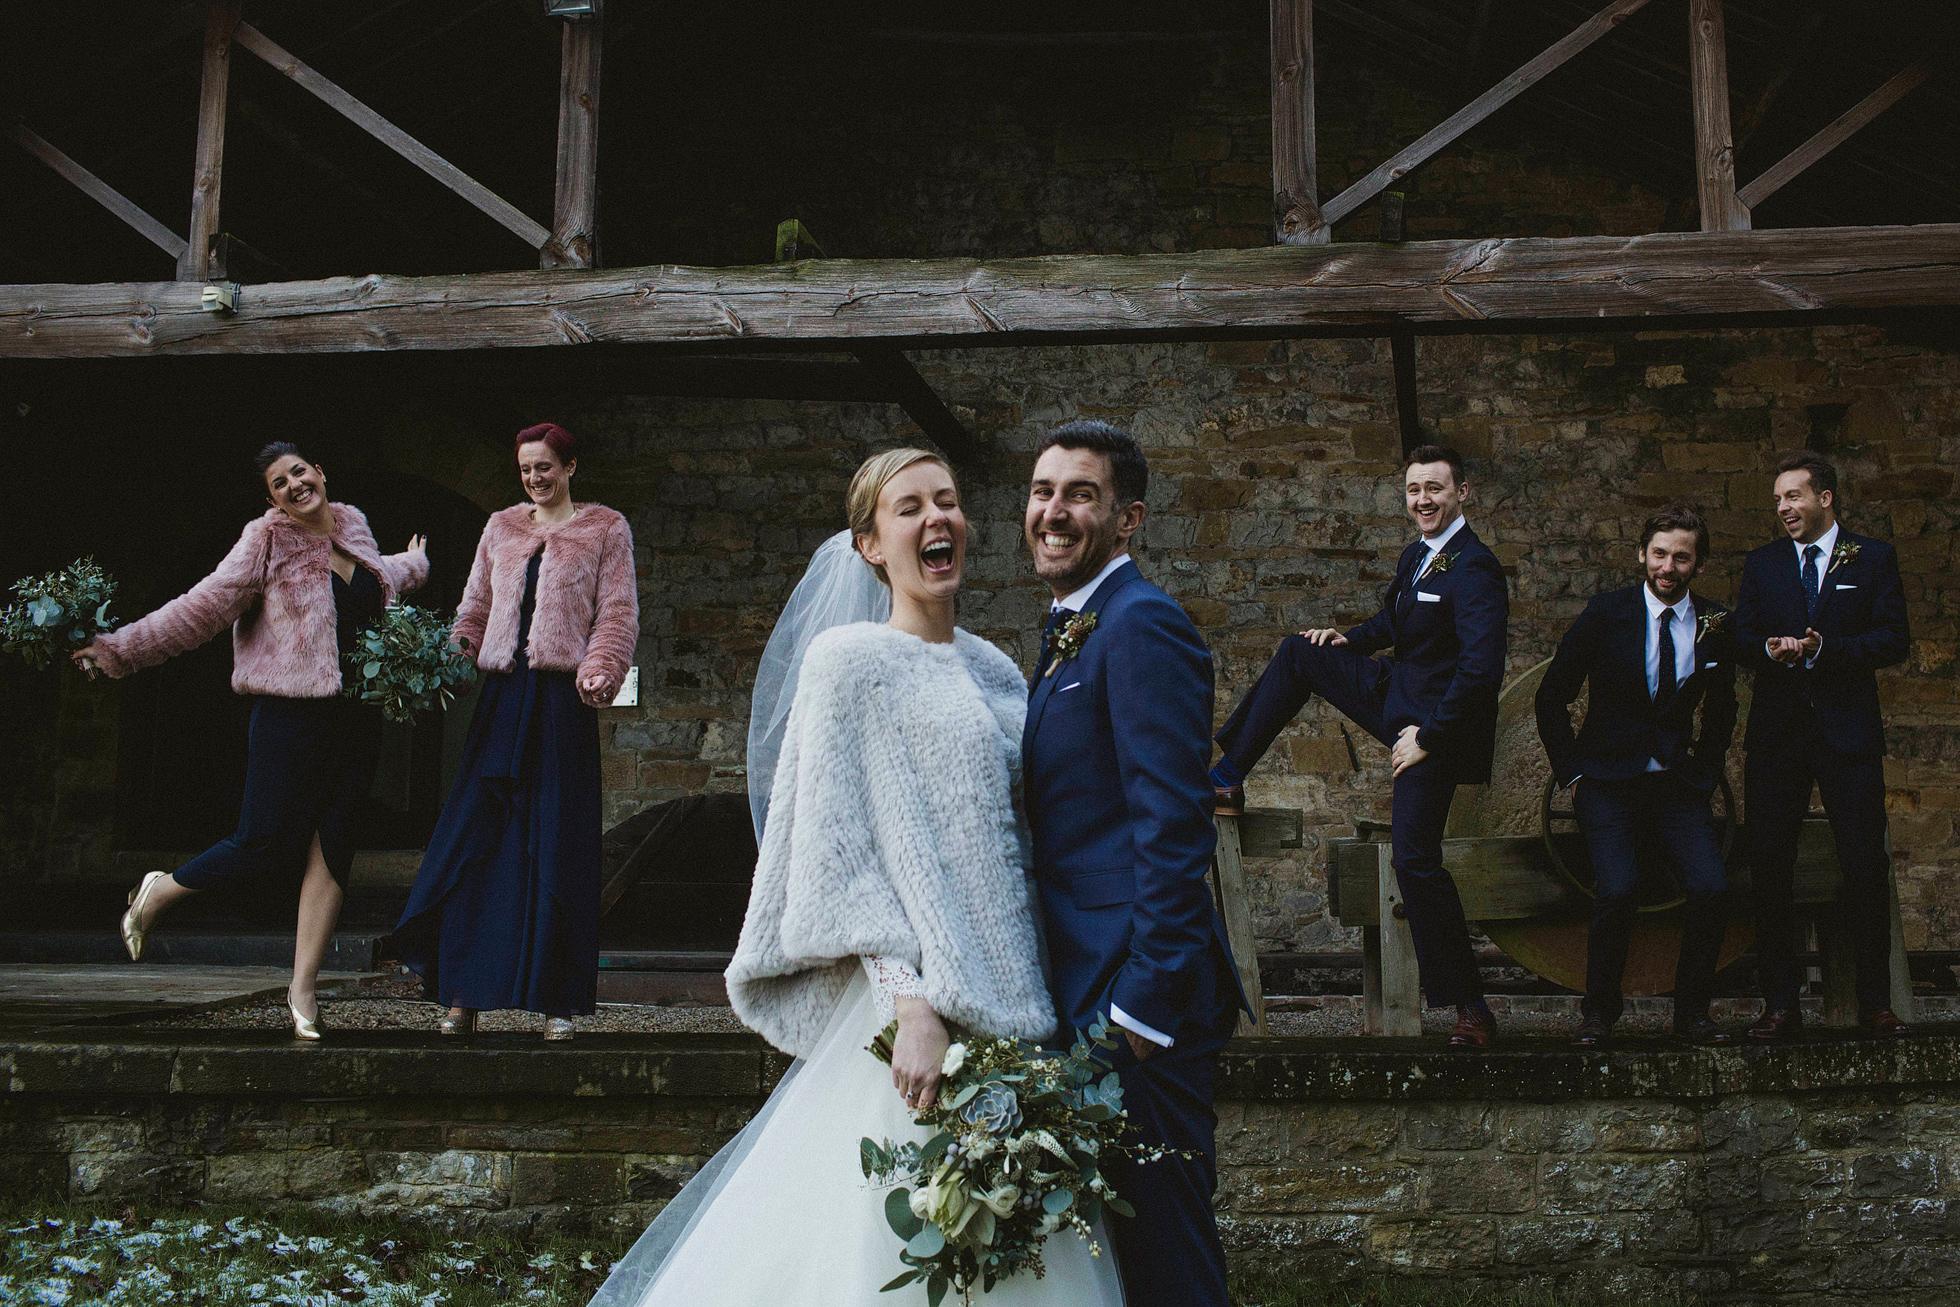 Broughton Hall Wedding Groups